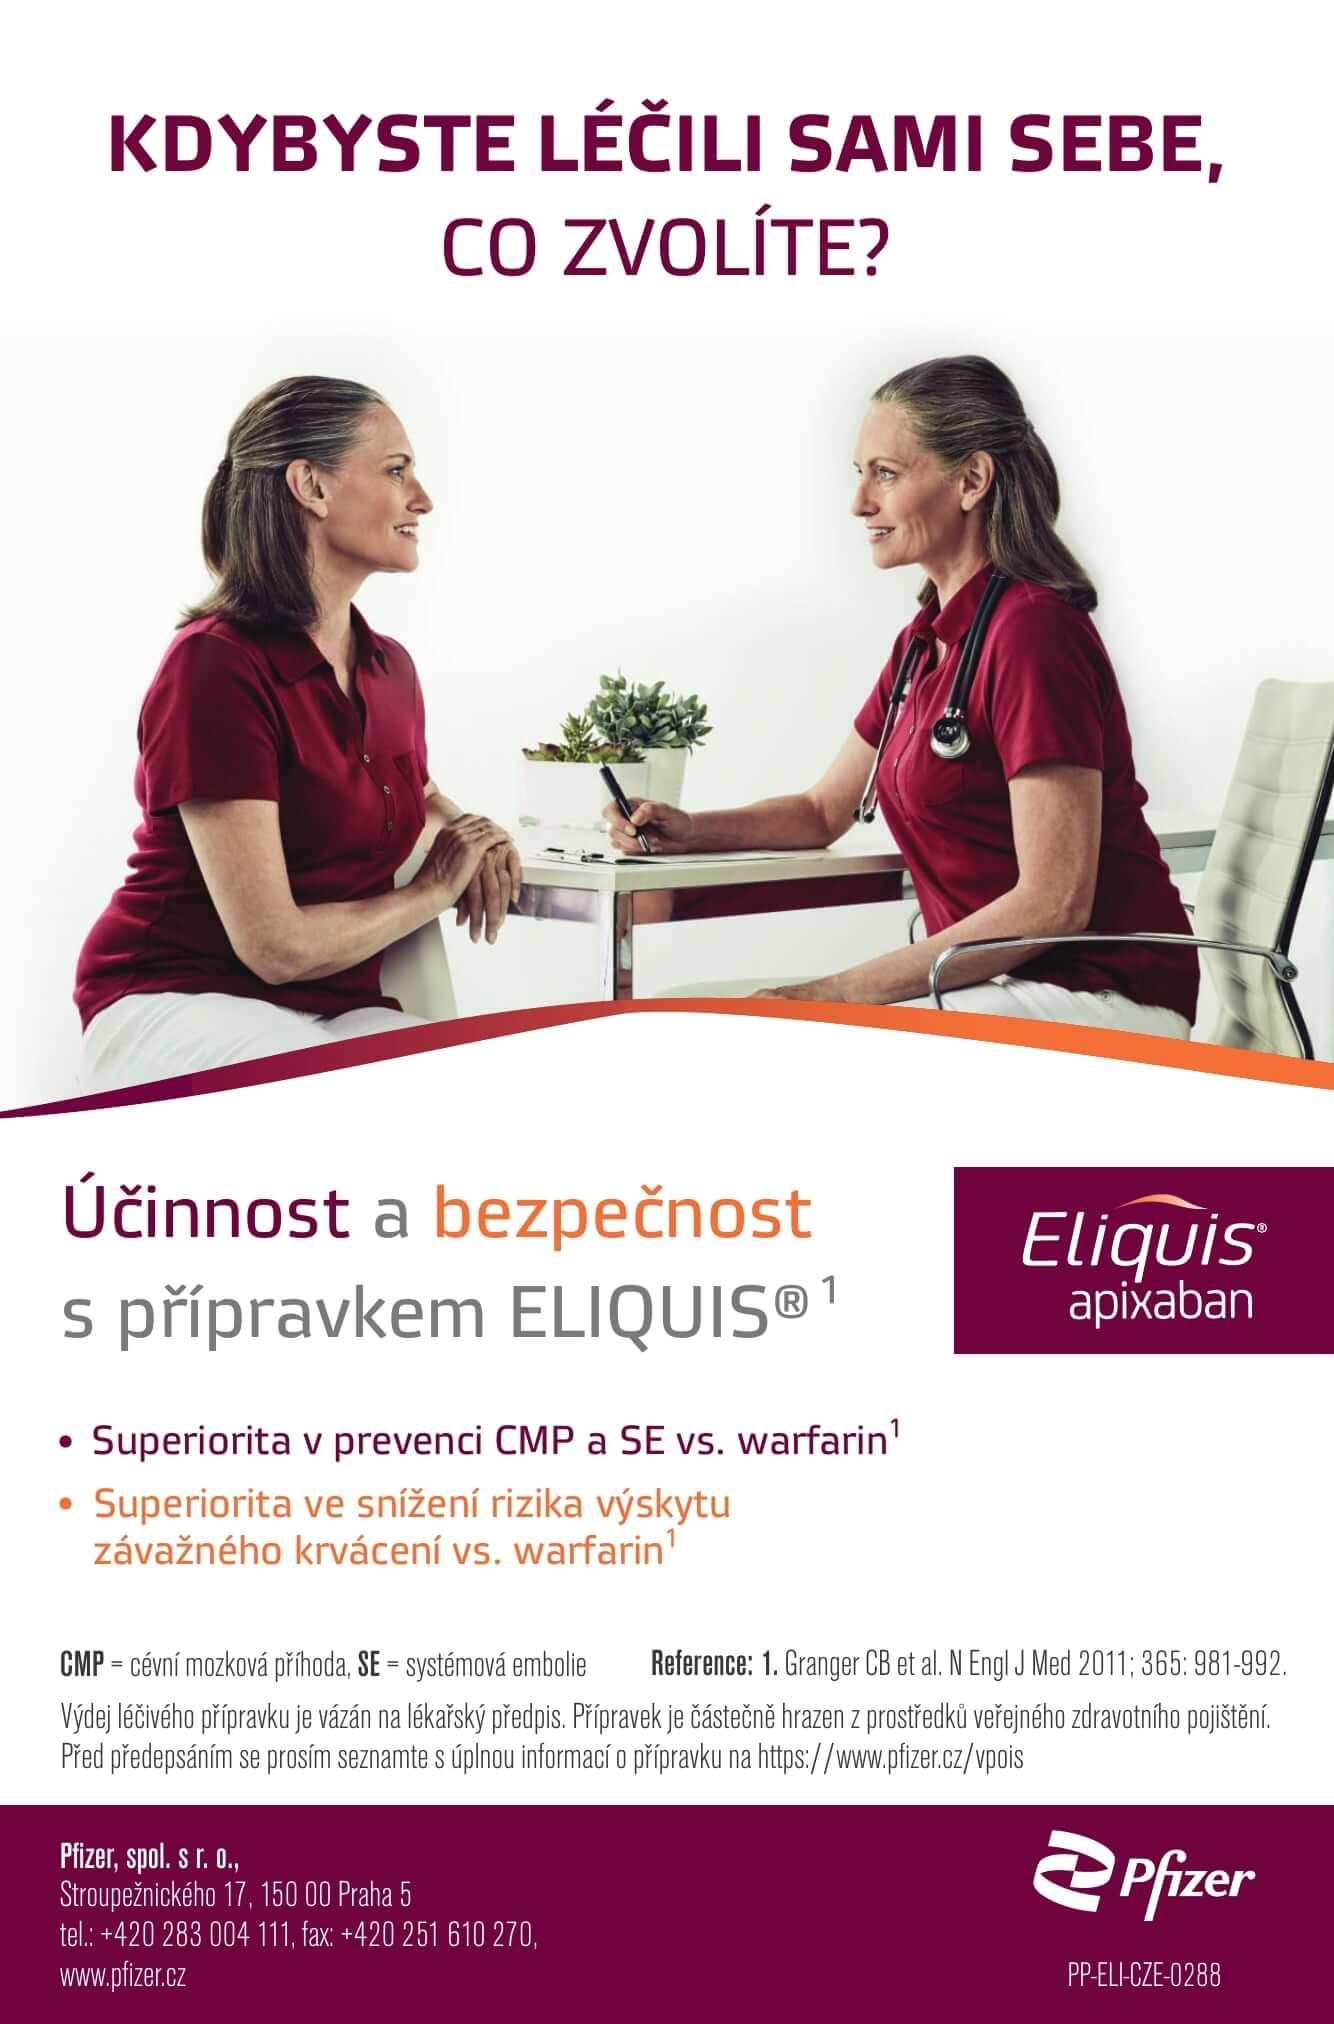 Pfizer - Eliquis